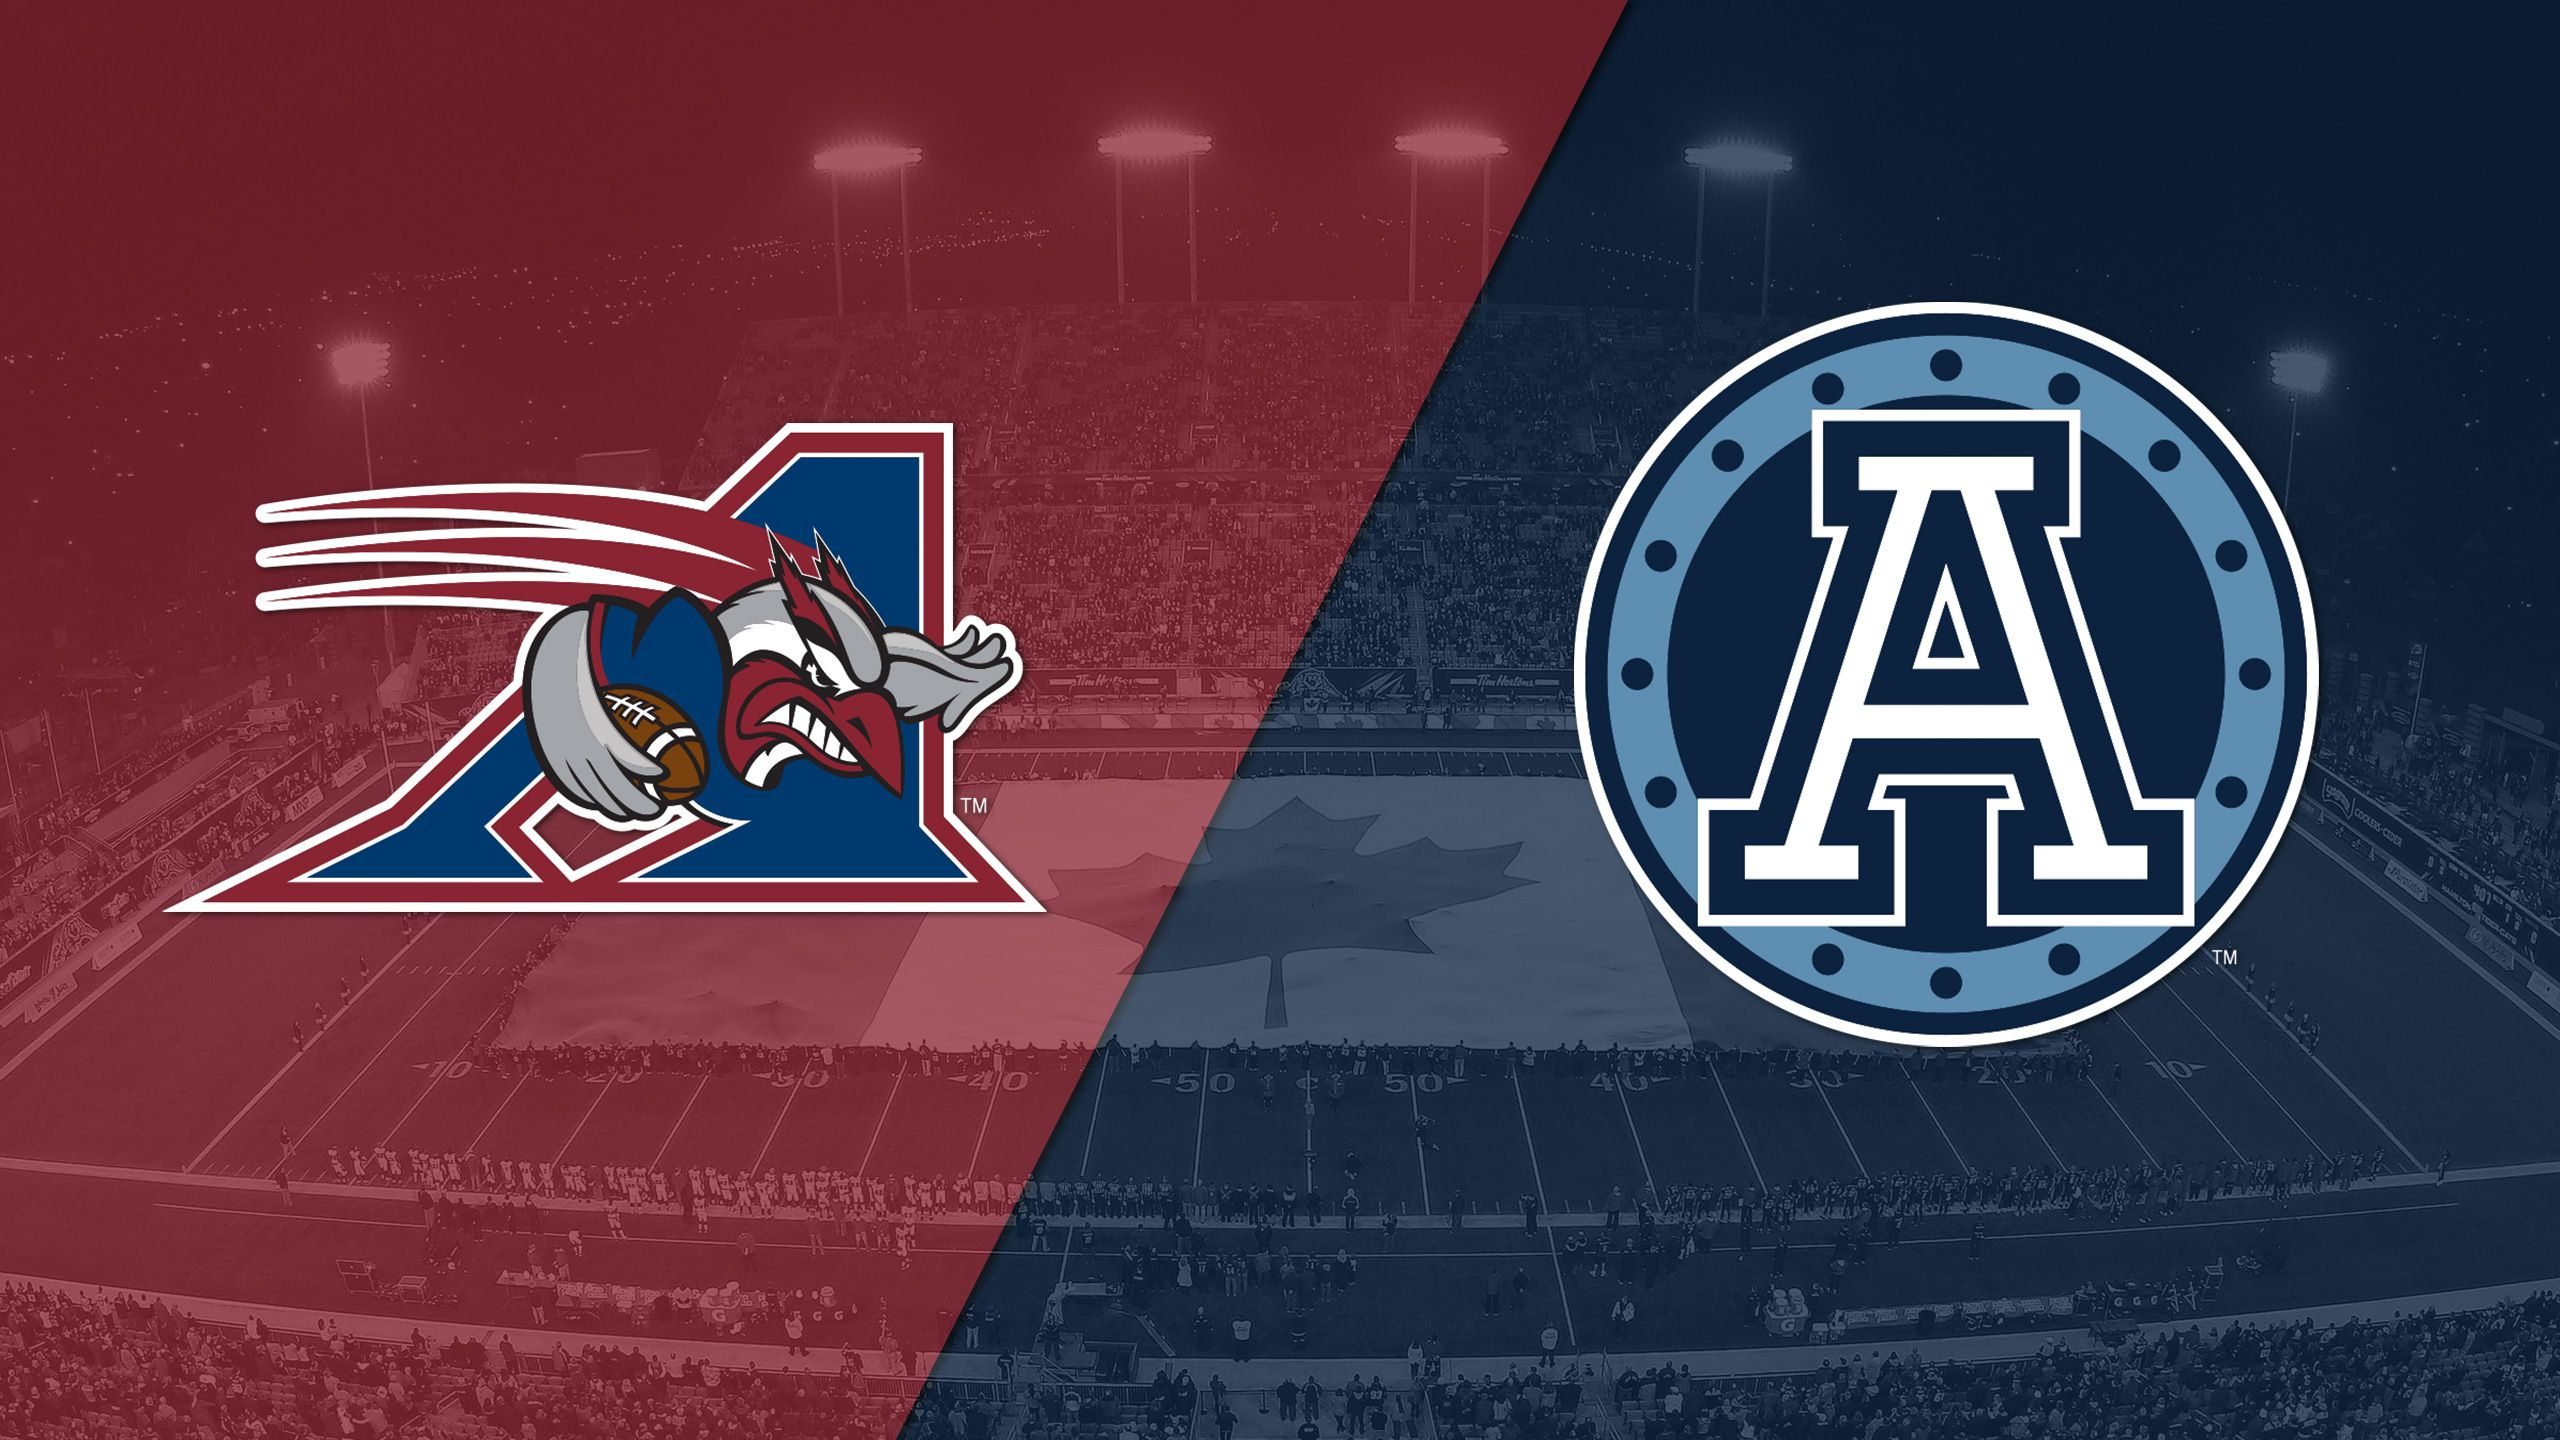 Montreal Alouettes vs. Toronto Argonauts